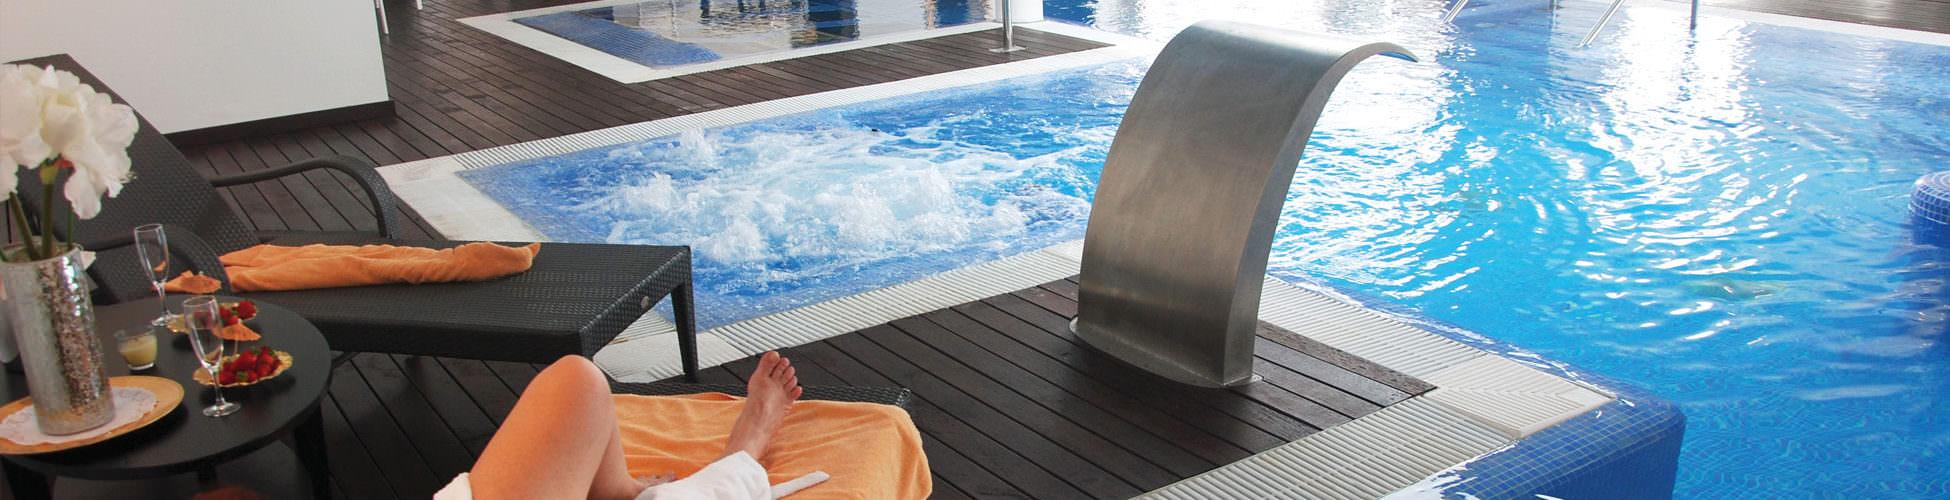 Aldea La Quinta Health Resort